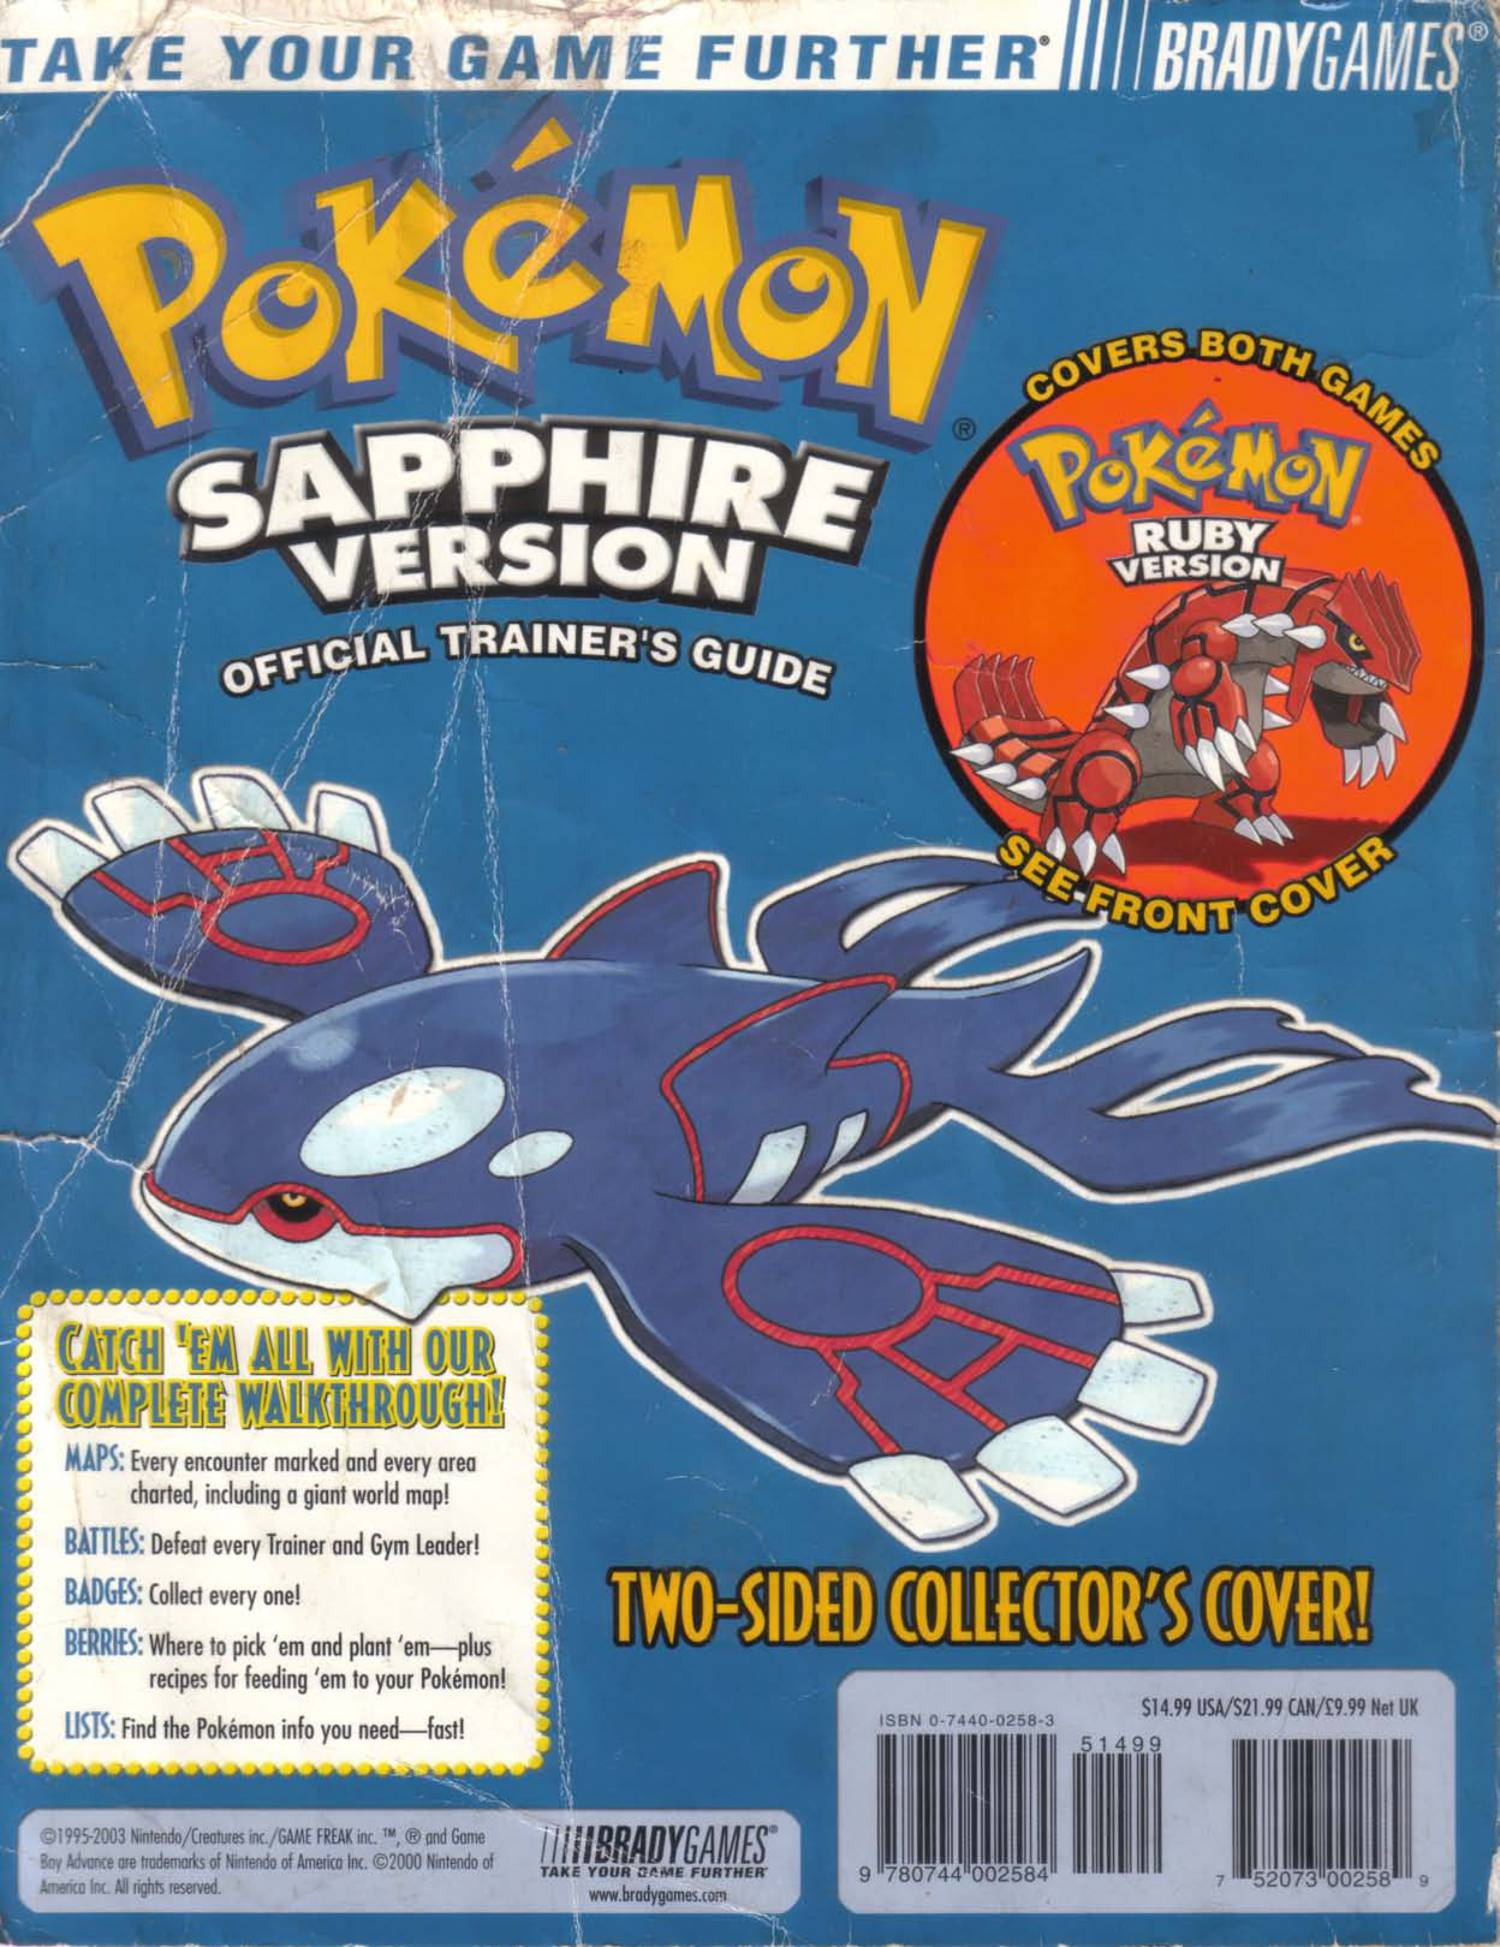 Brady 2003) - Pokemon Sapphire & Ruby pdf | DocDroid